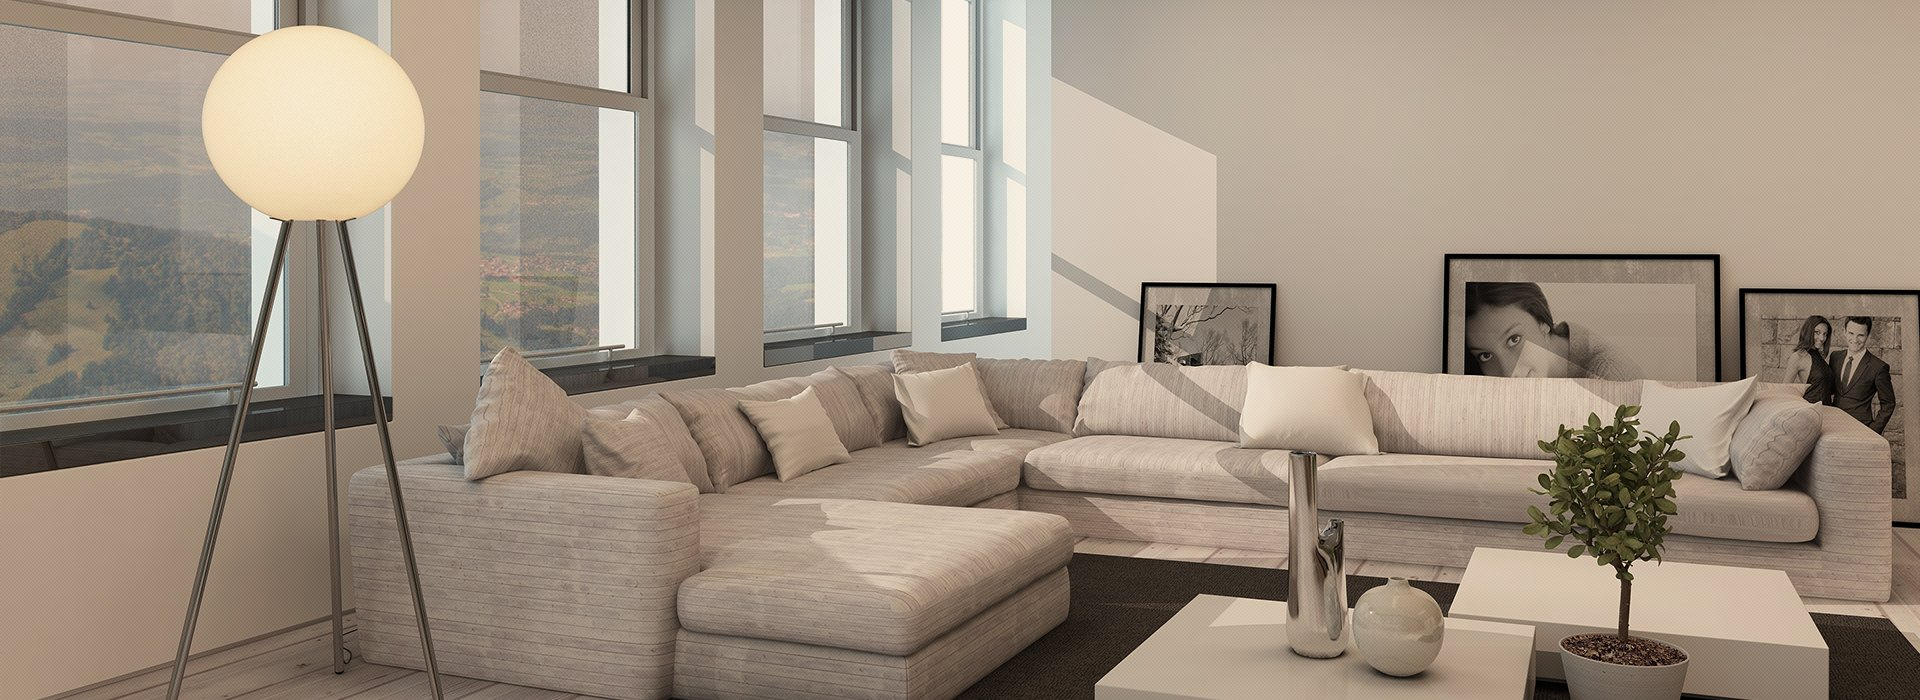 A large corner sofa